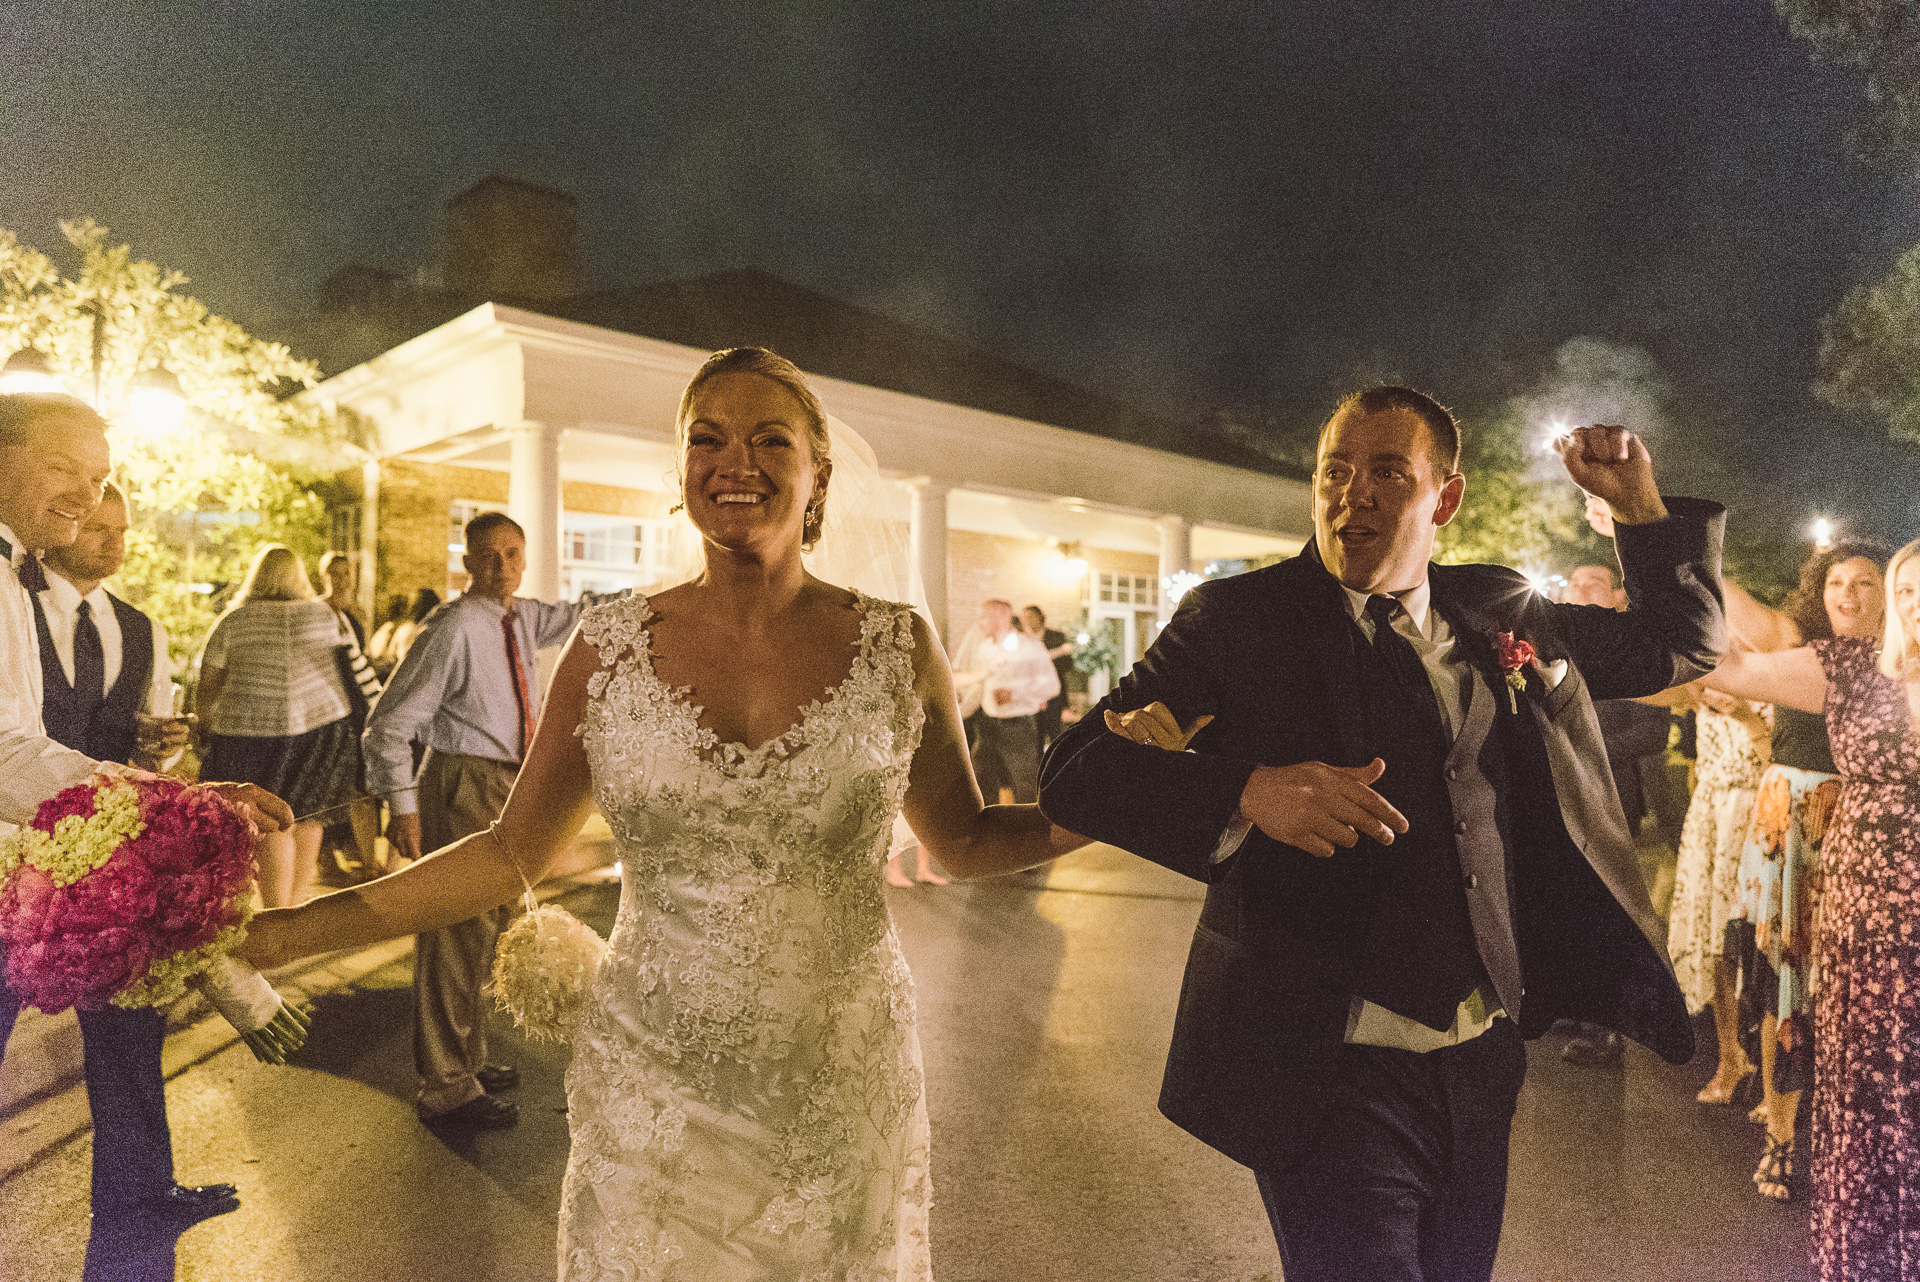 Dayton Wedding Photographer - Sparkler exit